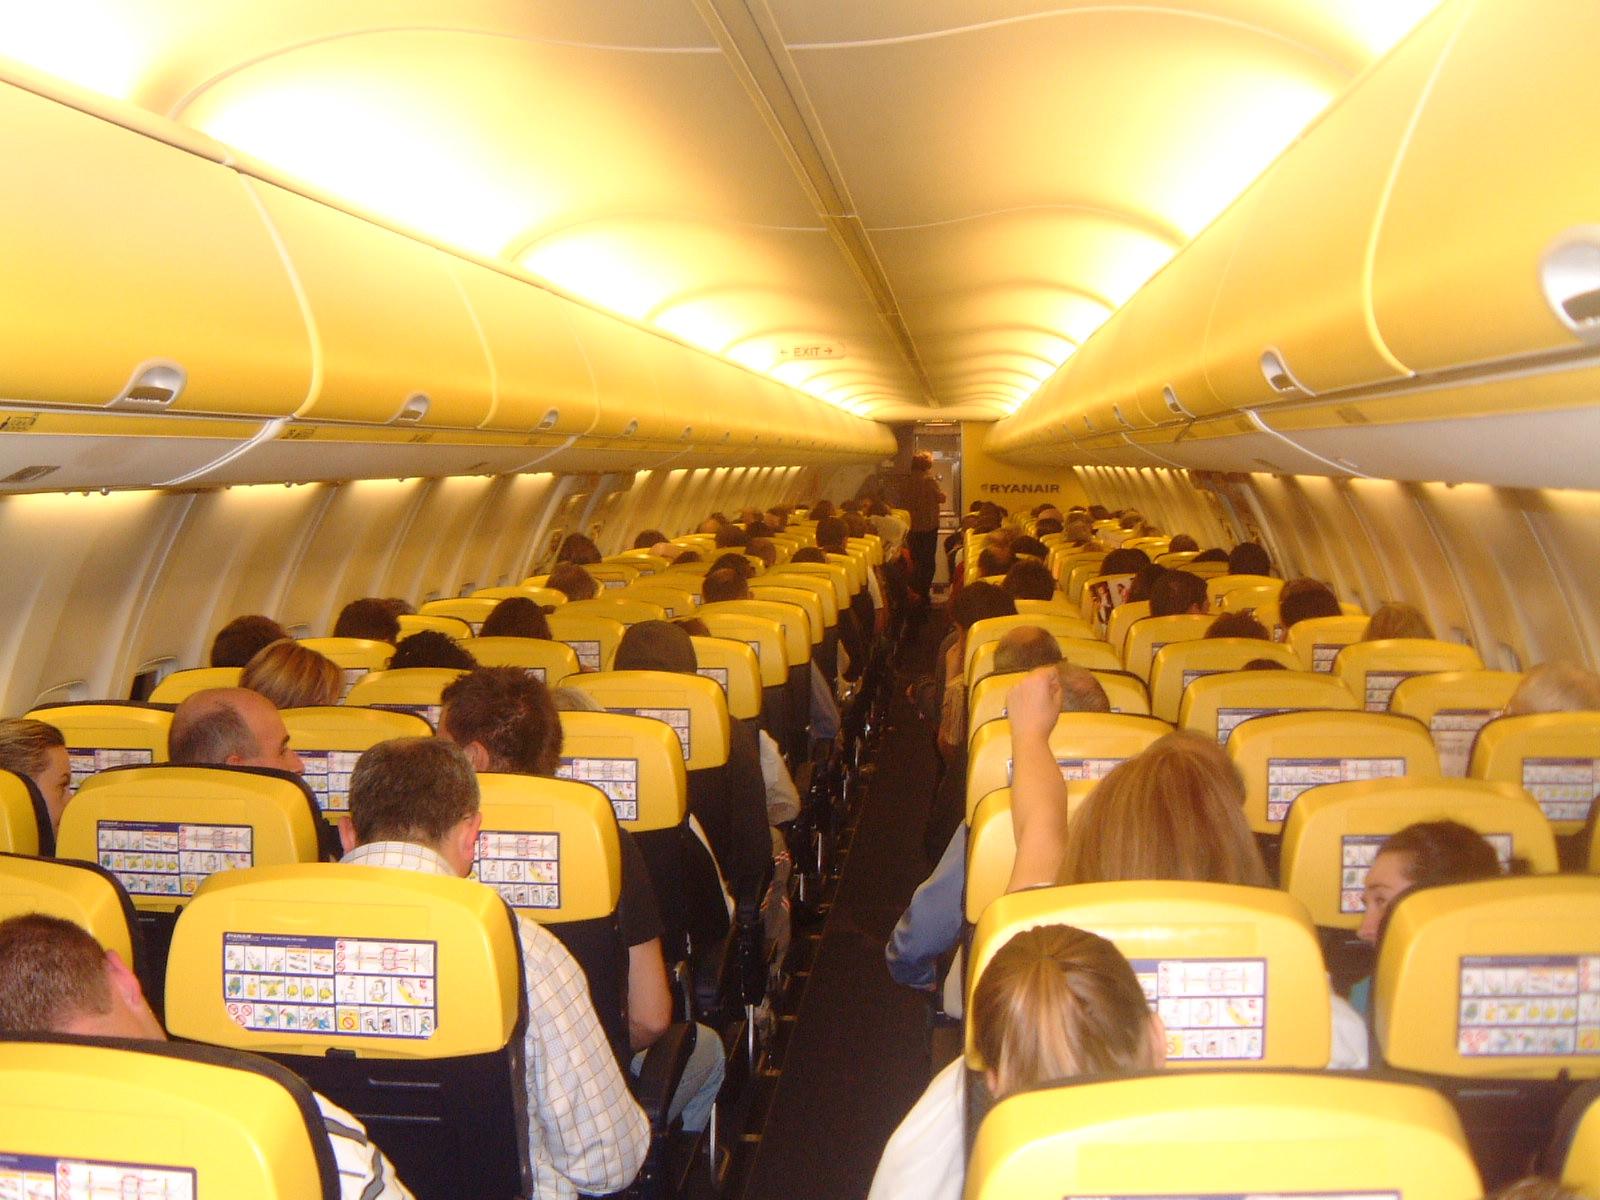 Сколько стоит билет на самолет москва аликанте университет